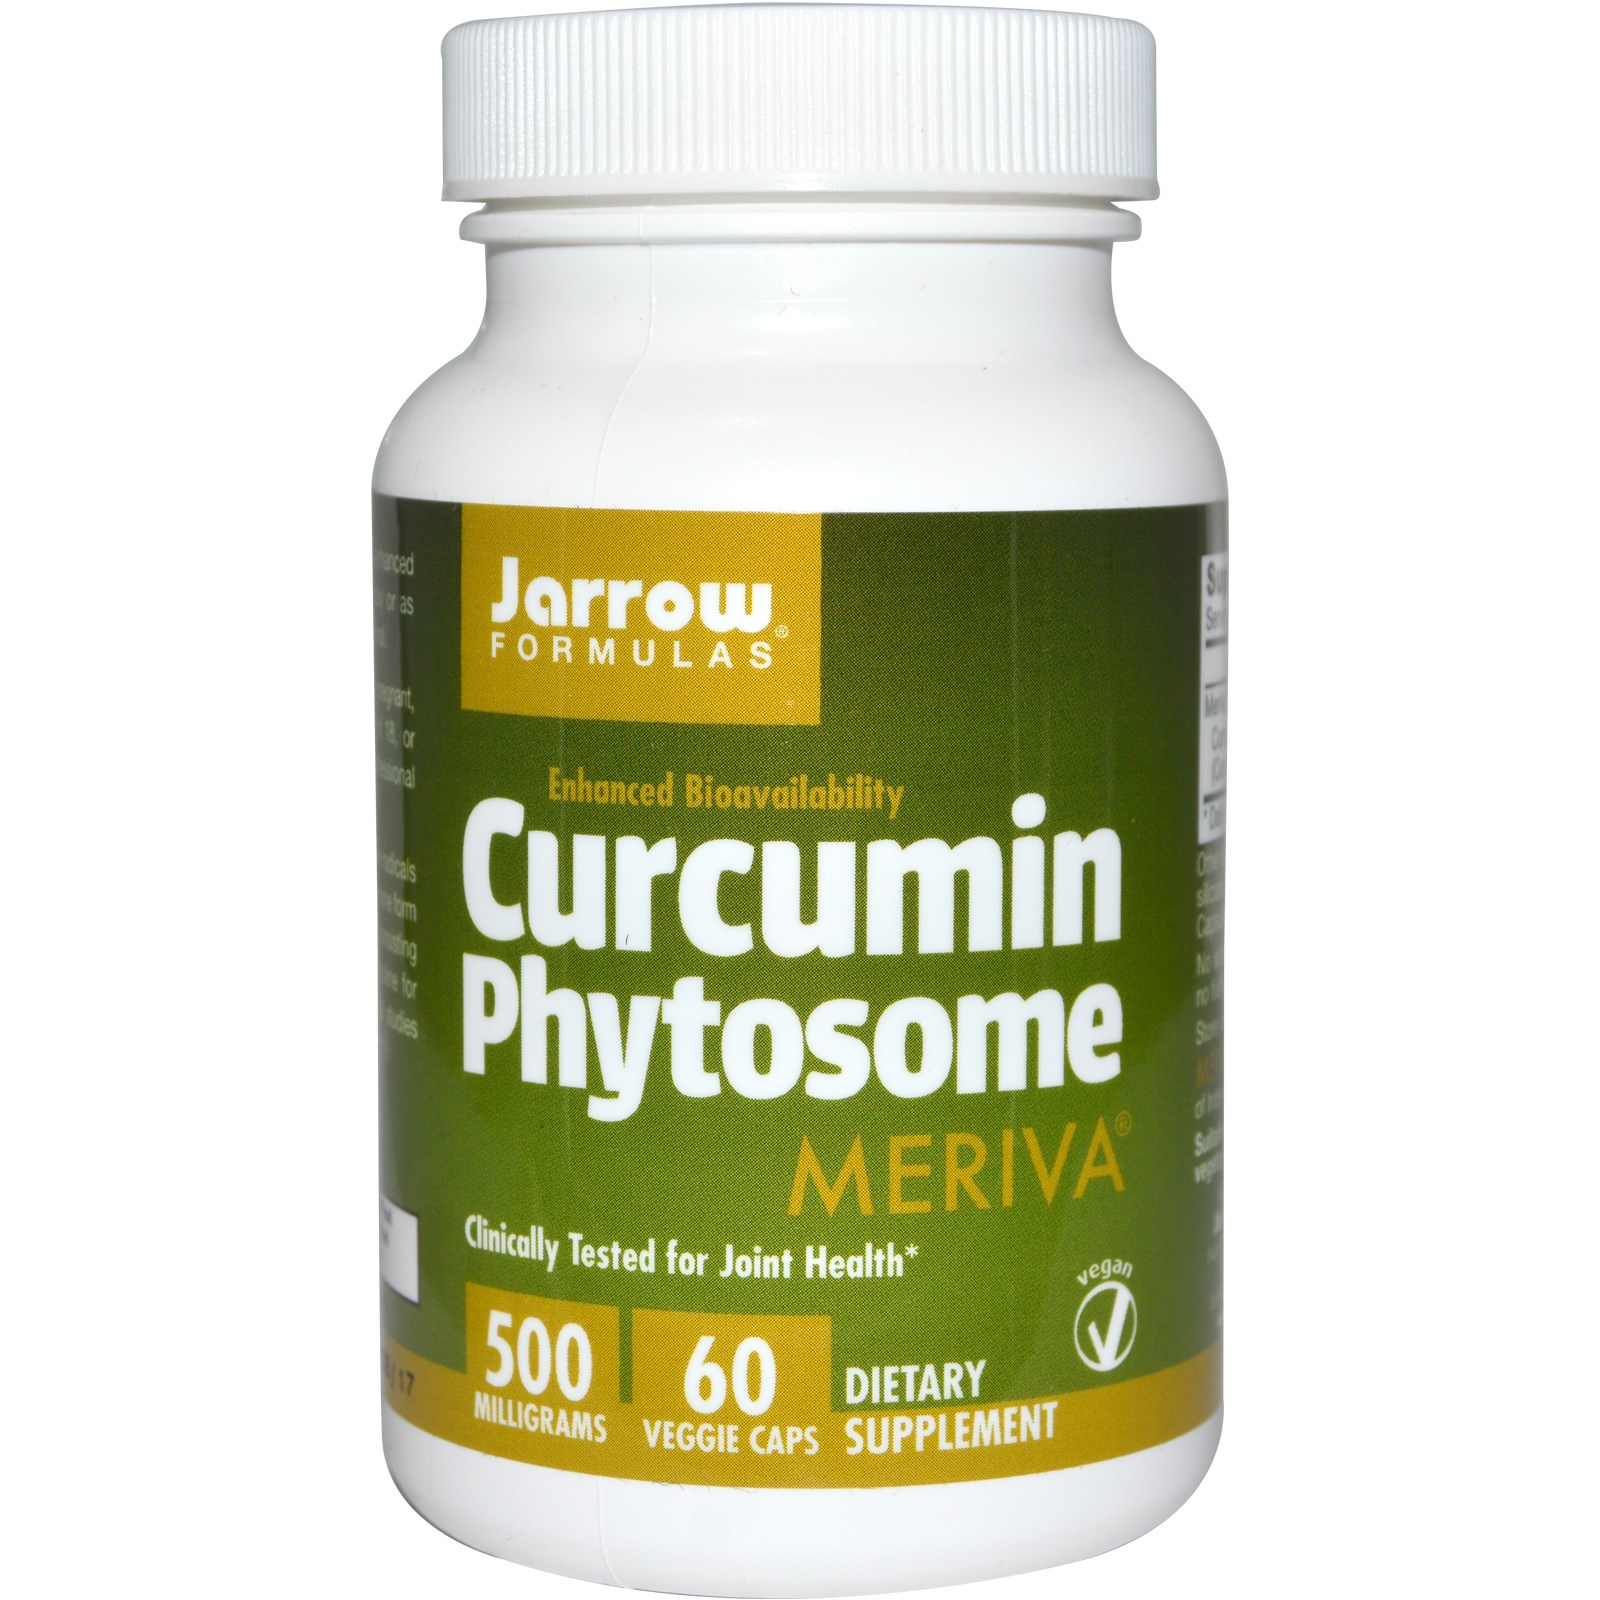 Image of Curcumin Phytosome 500 mg (60 Veggie Caps) - Jarrow Formulas 0790011140863